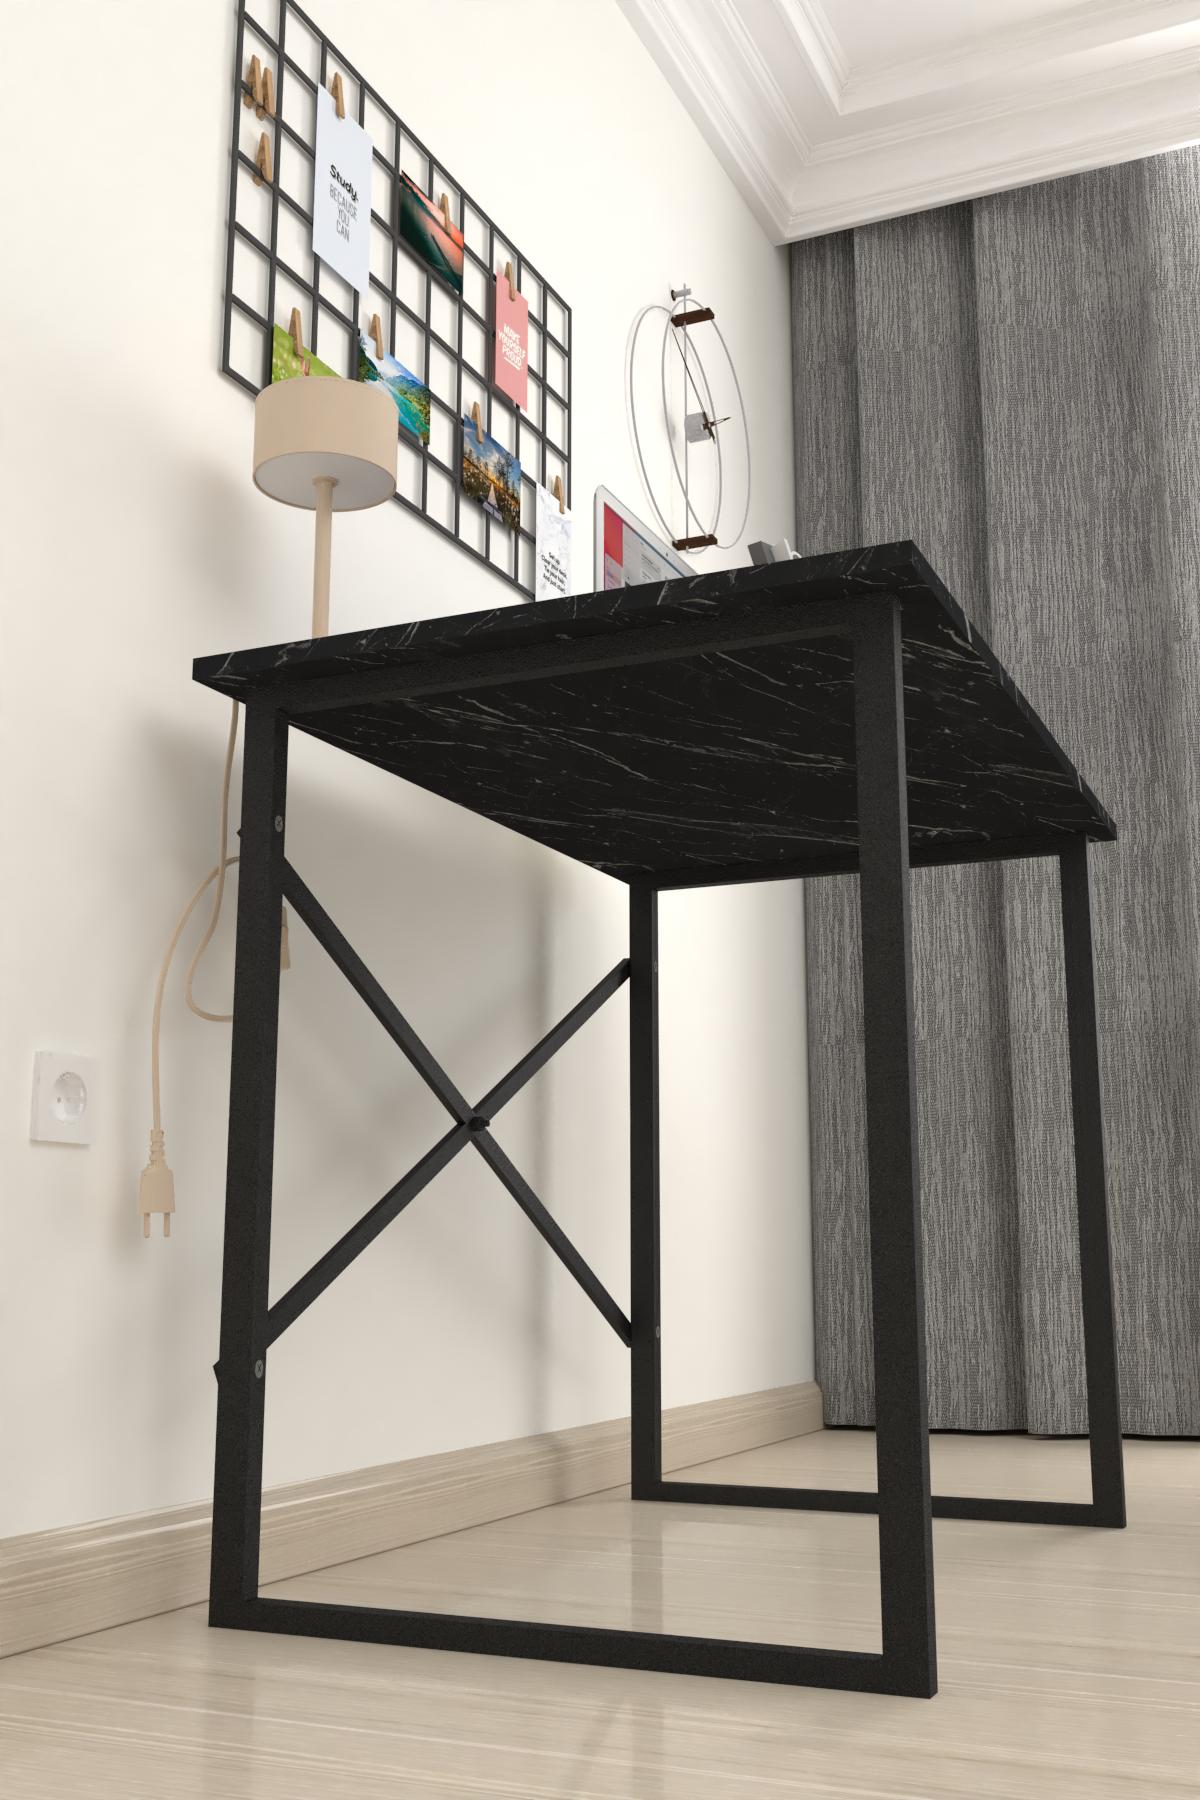 Bofigo Çalışma Masası 60x90 cm Bendir